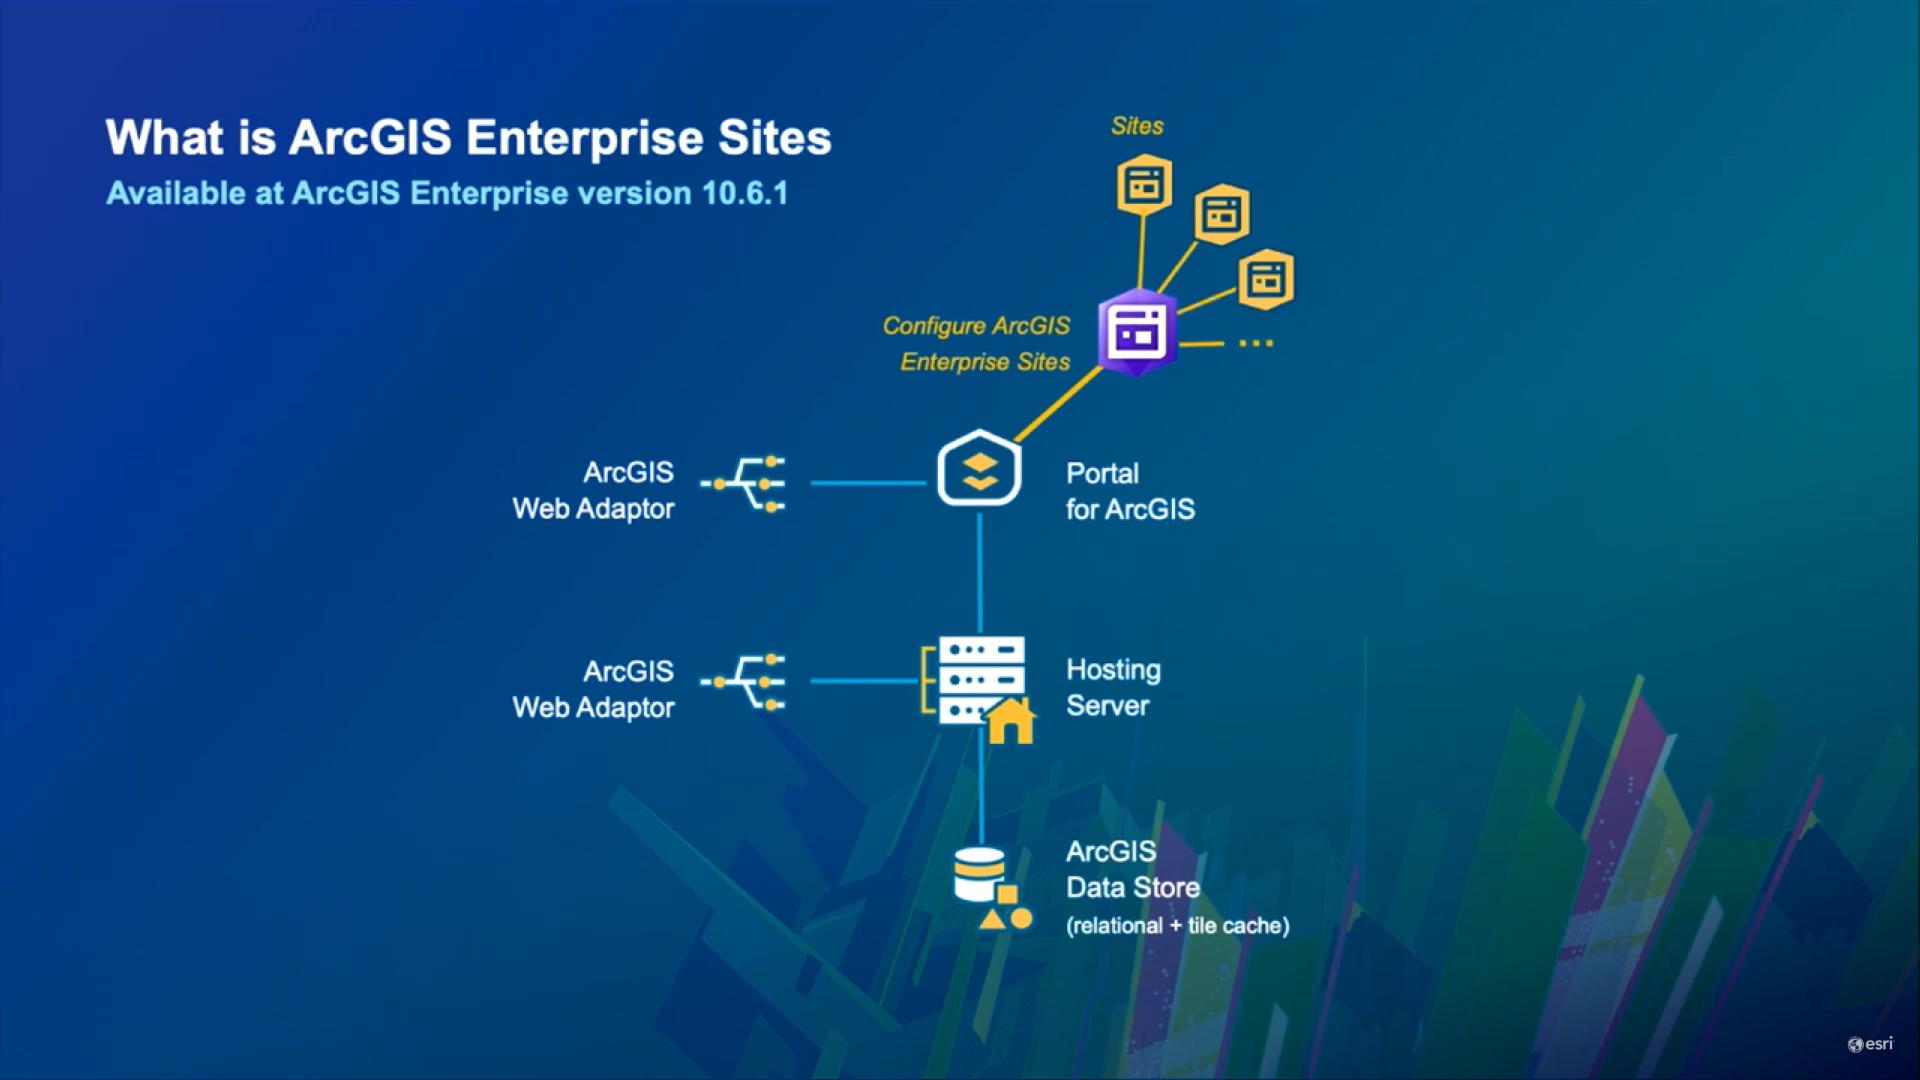 Architecting ArcGIS Enterprise & Hub Sites | GeoMarvel